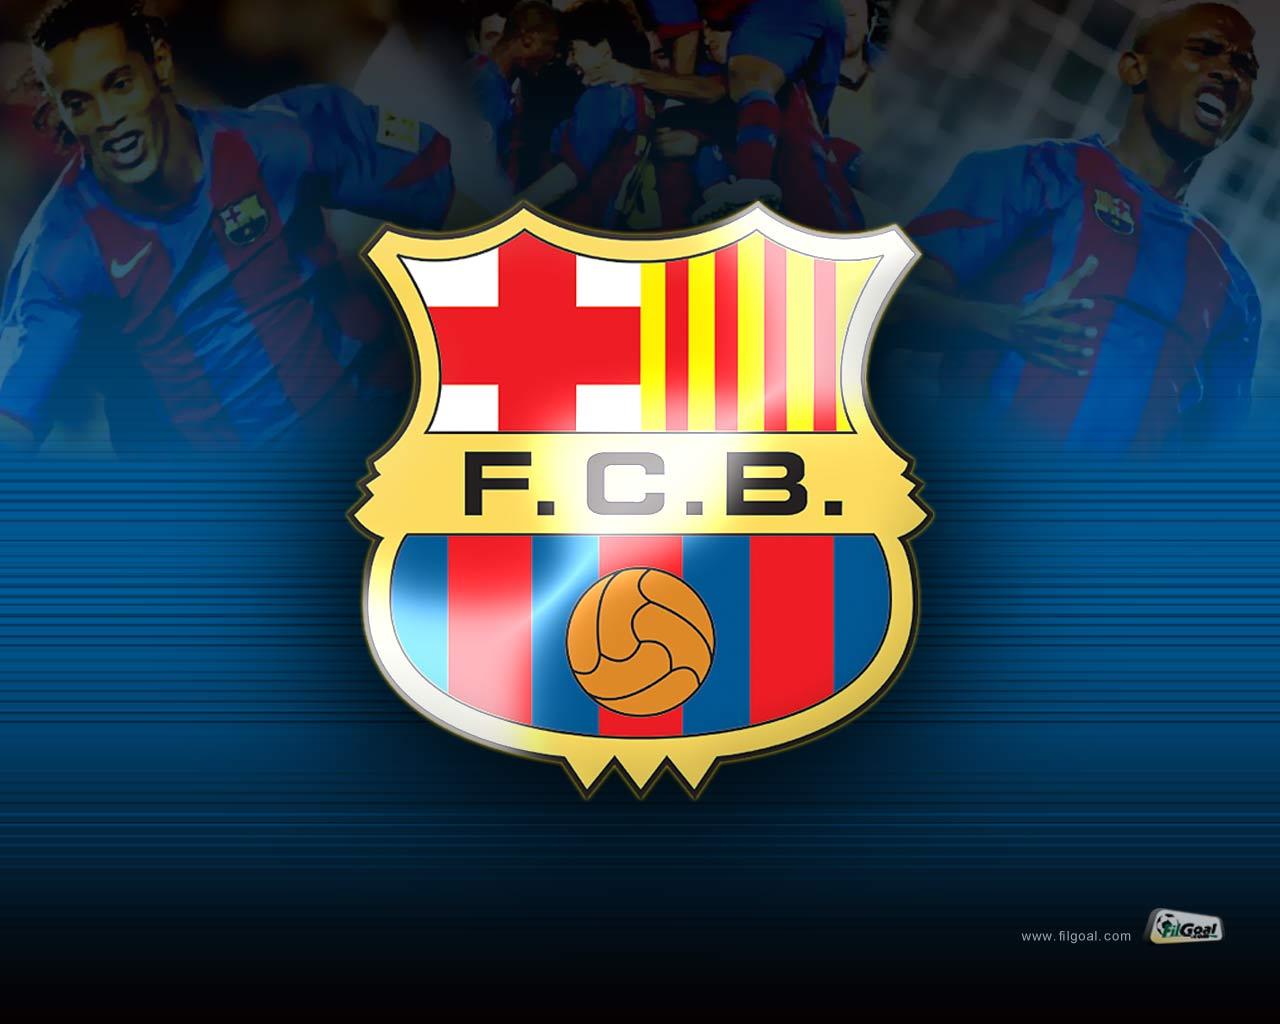 FC Barcelona Wallpapers fc barcelona 484411 1280 1024jpg 1280x1024